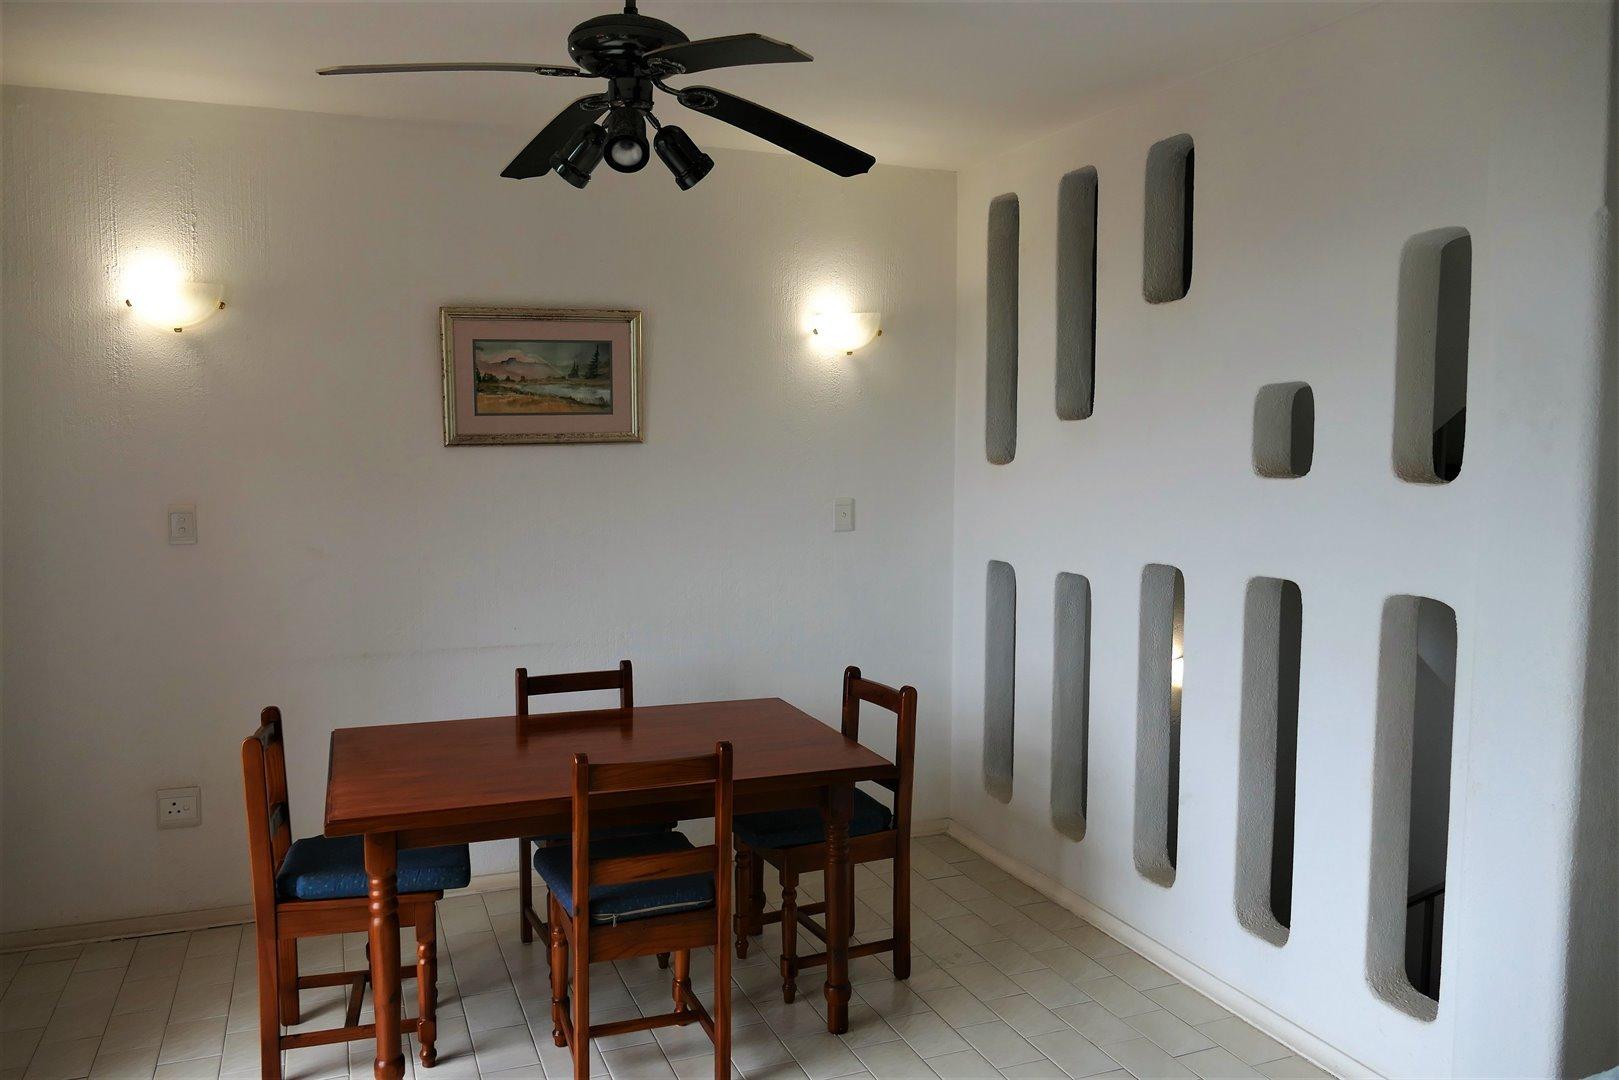 Scottburgh Central property for sale. Ref No: 13520906. Picture no 19